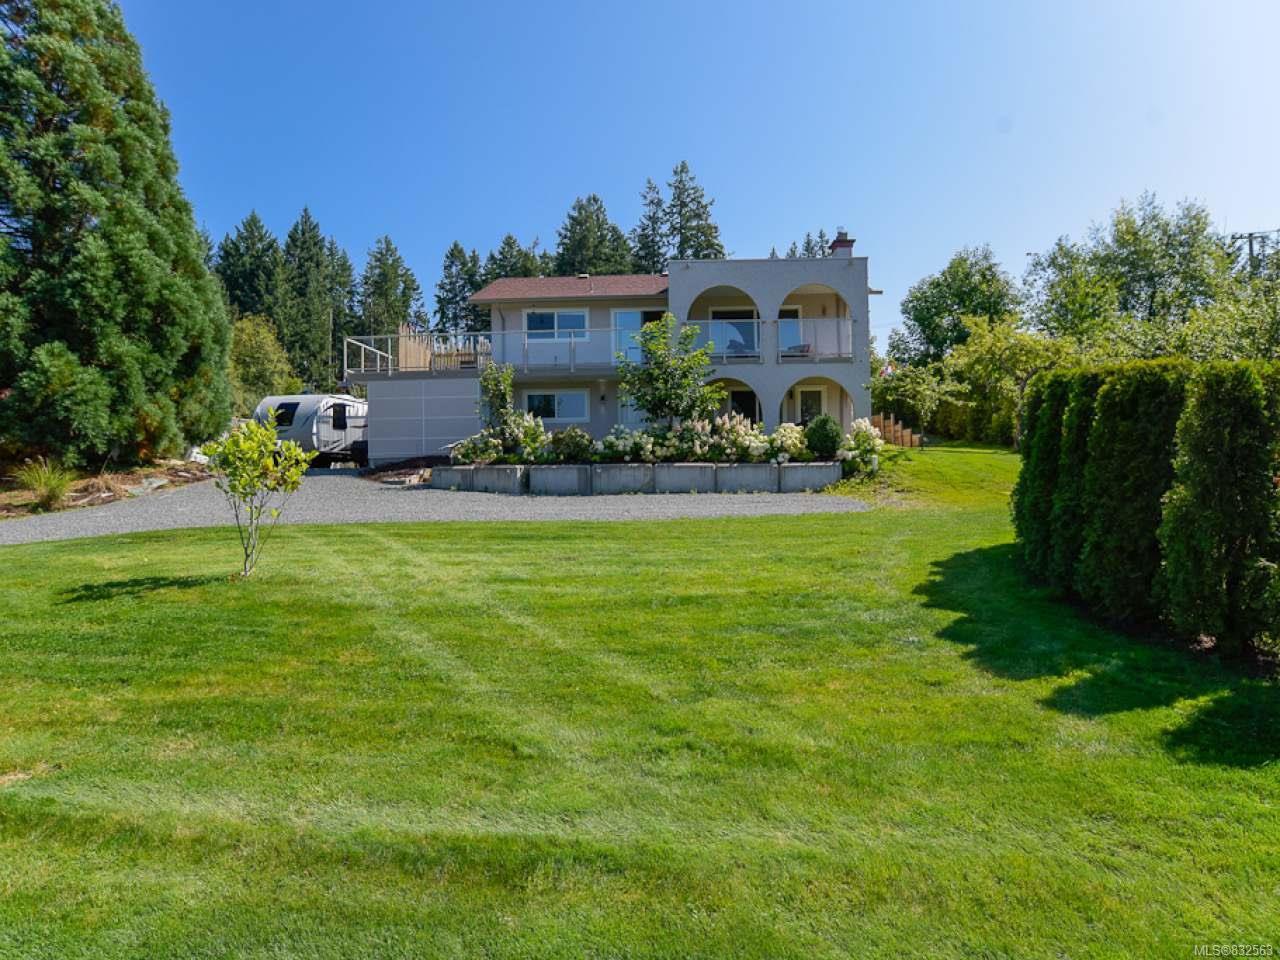 Main Photo: 1550 McDonald Rd in COMOX: CV Comox (Town of) House for sale (Comox Valley)  : MLS®# 832563